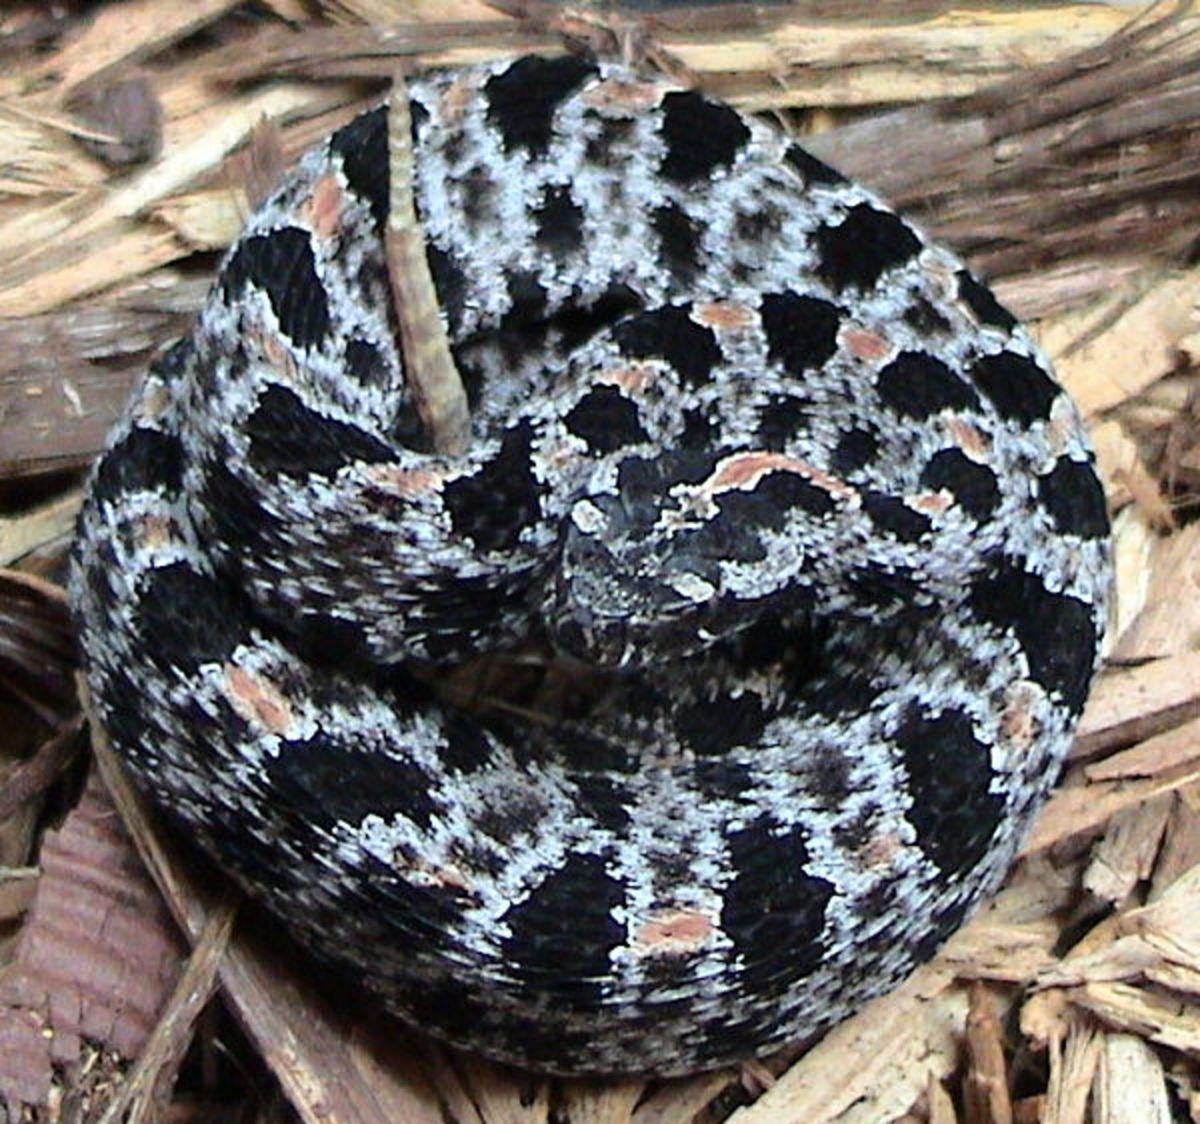 Western Pygmy Rattlesnake, Sistrurus miliarius streckeri